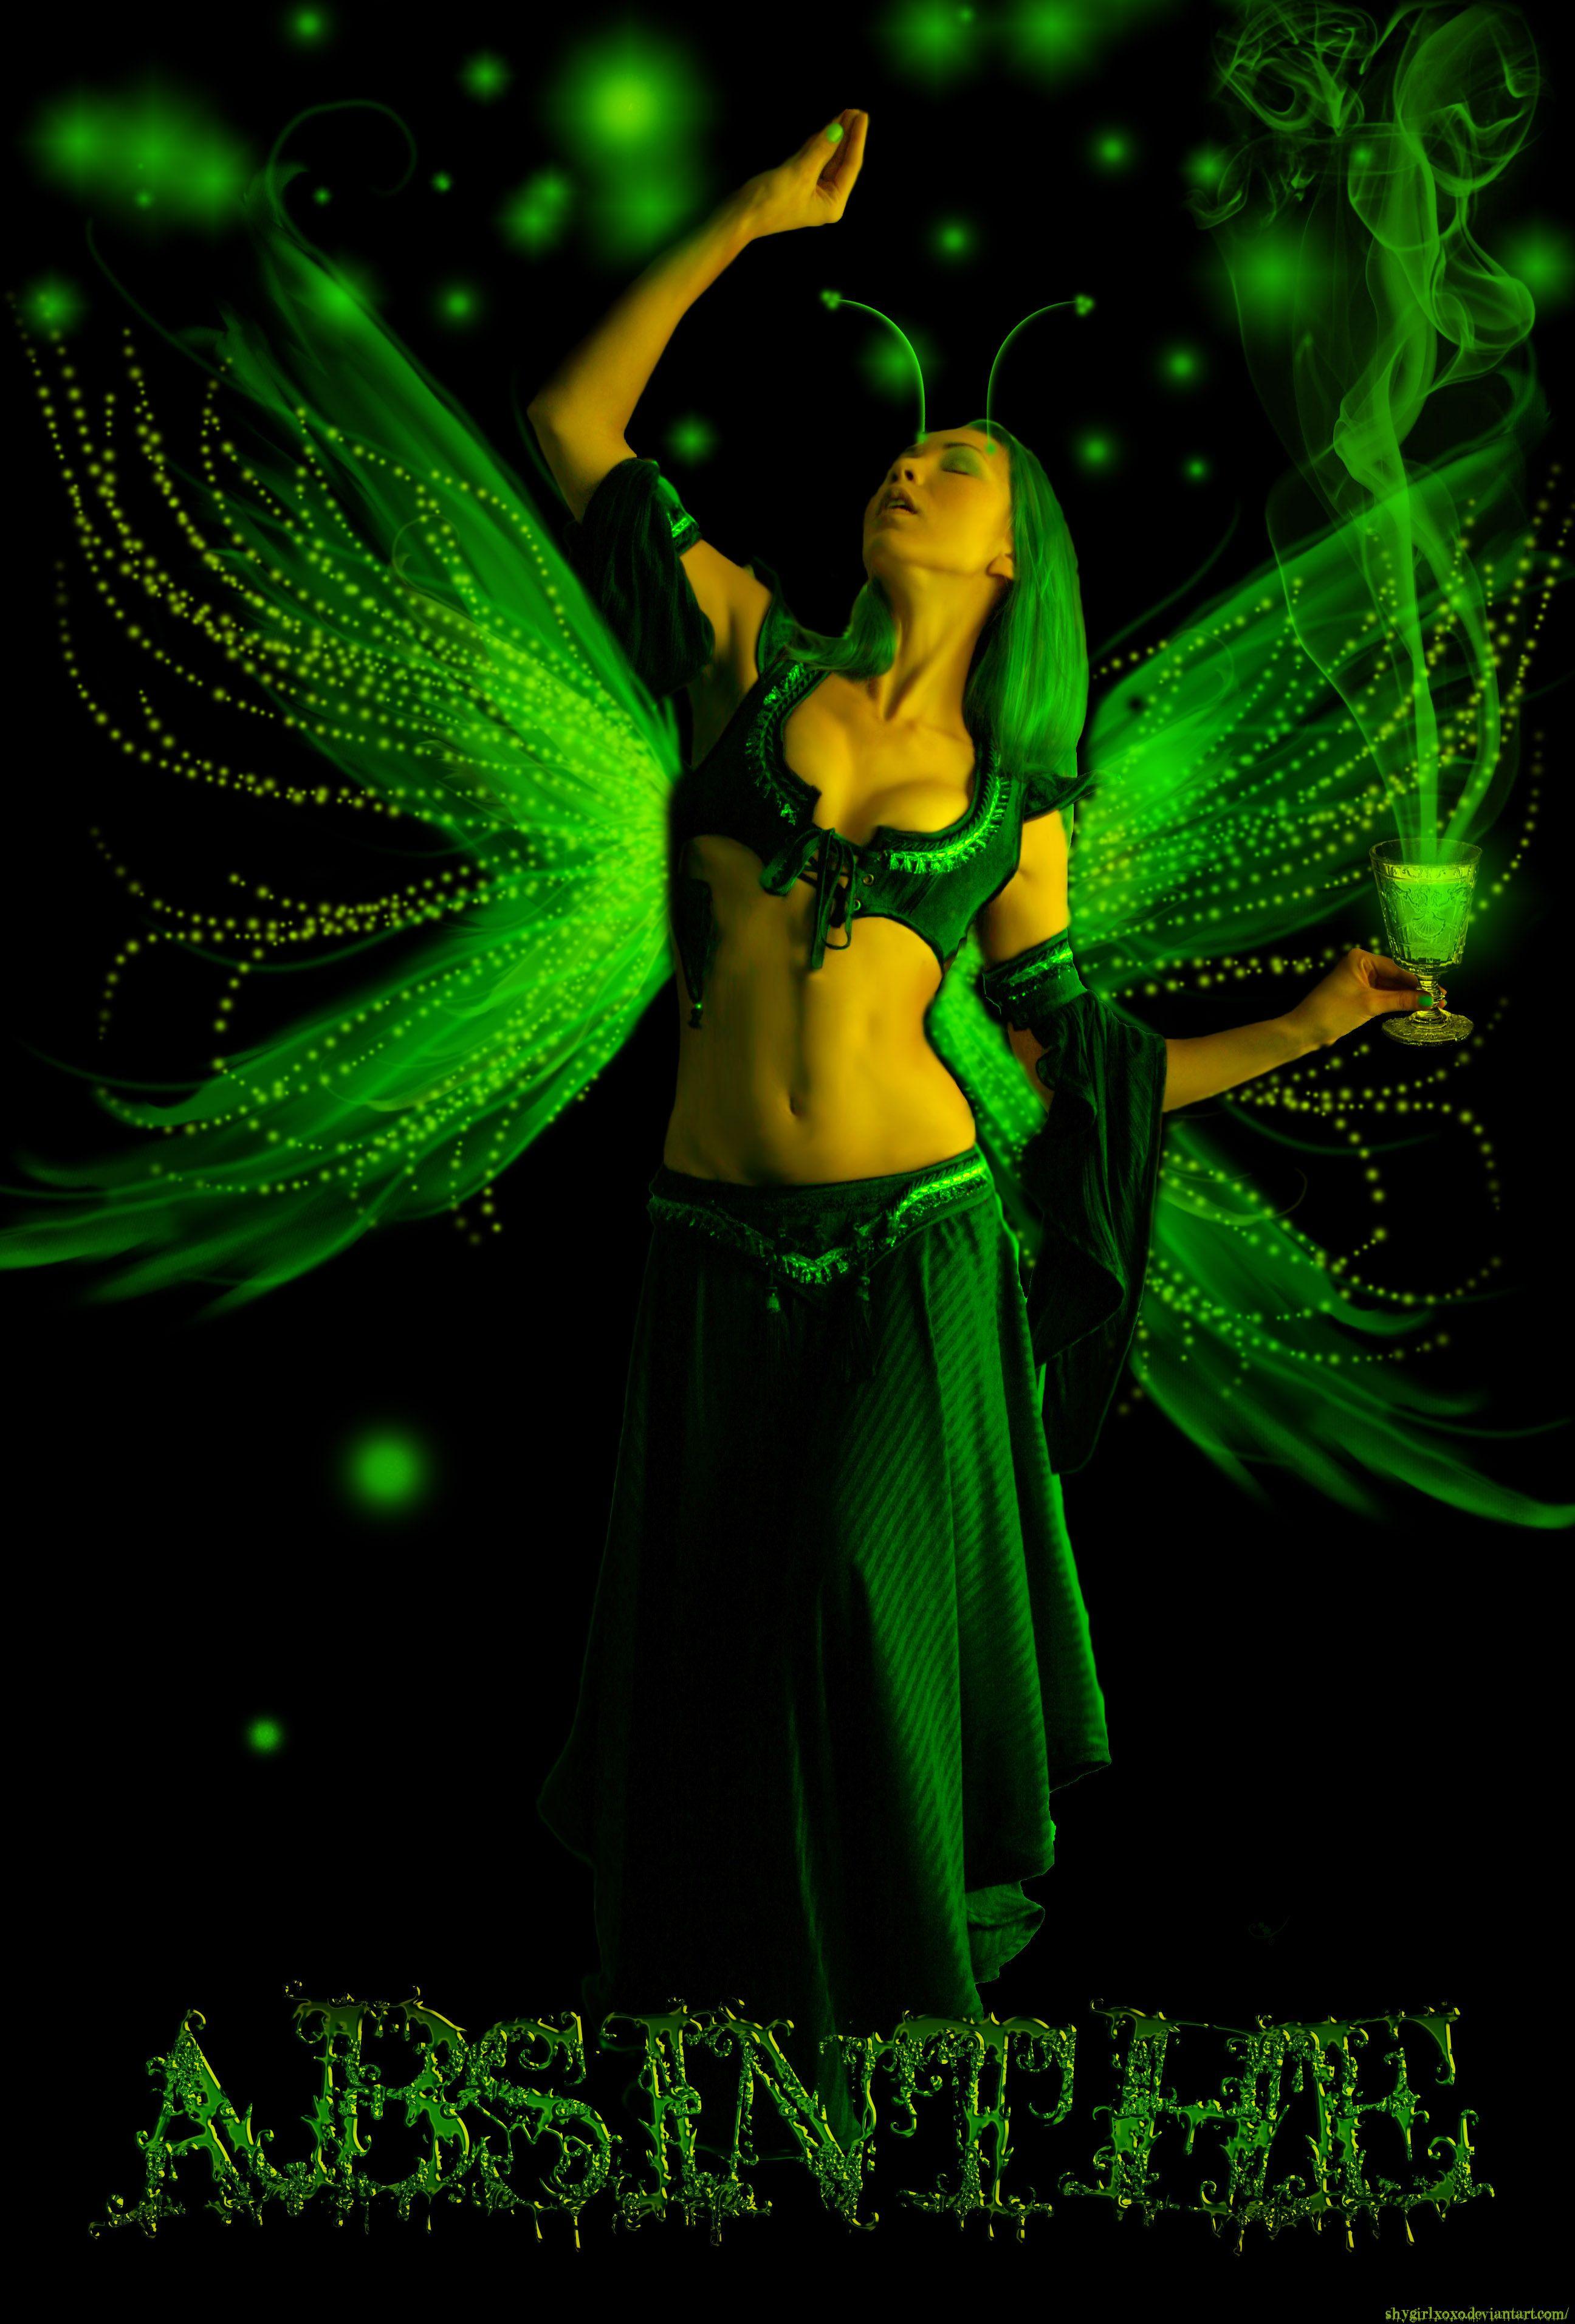 Absinthe Green Fairy costume ideas  sc 1 st  Pinterest & Absinthe Green Fairy costume ideas | ad art | Pinterest | Green ...